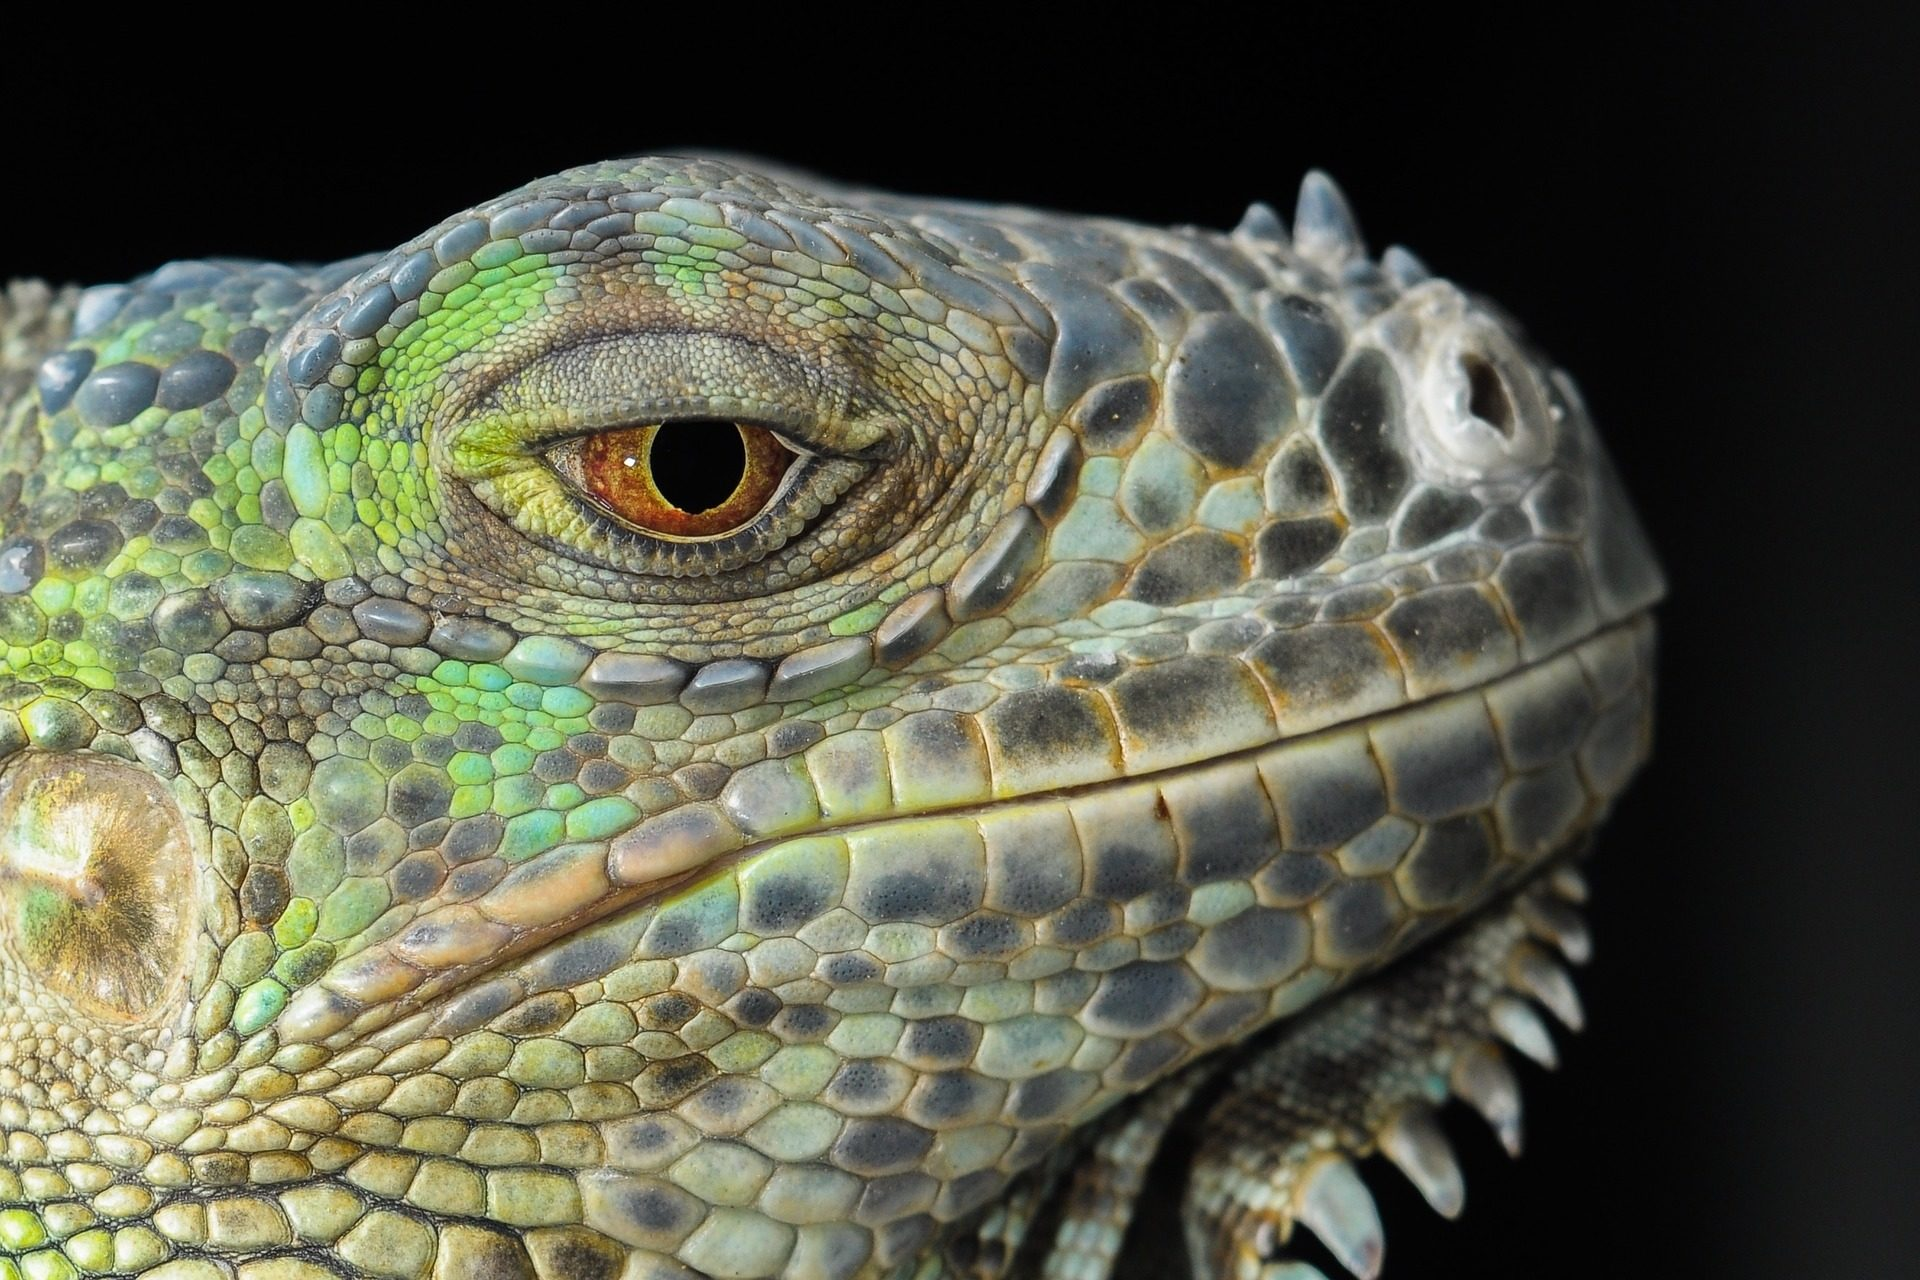 lézard, Iguane, Reptile, Dragon, yeux - Fonds d'écran HD - Professor-falken.com